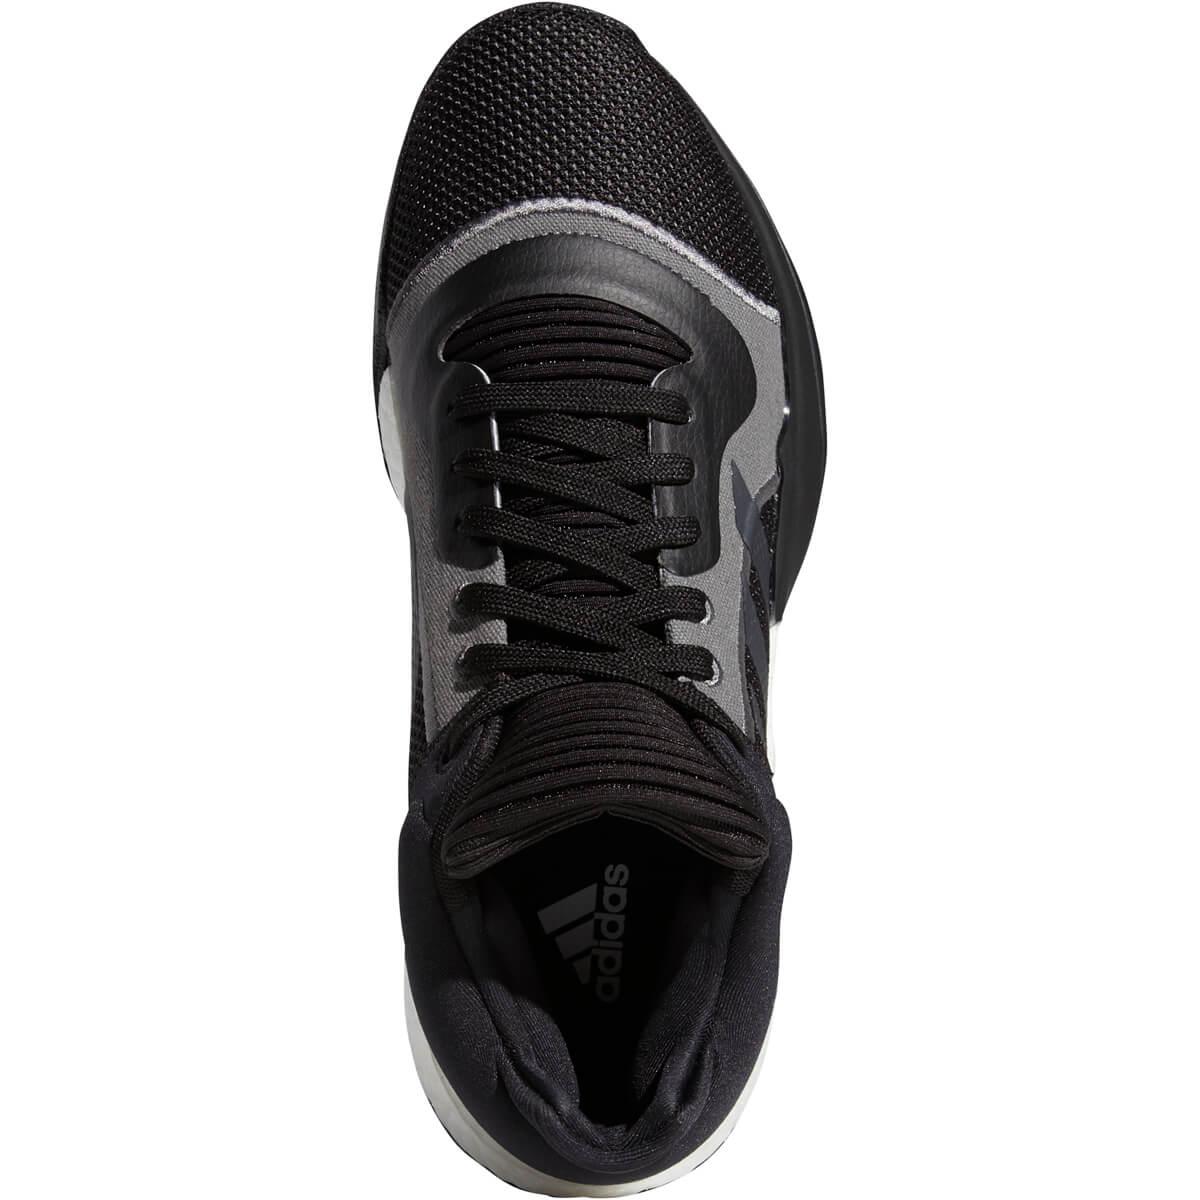 adidas Marquee Boost Basketboldsko Herre